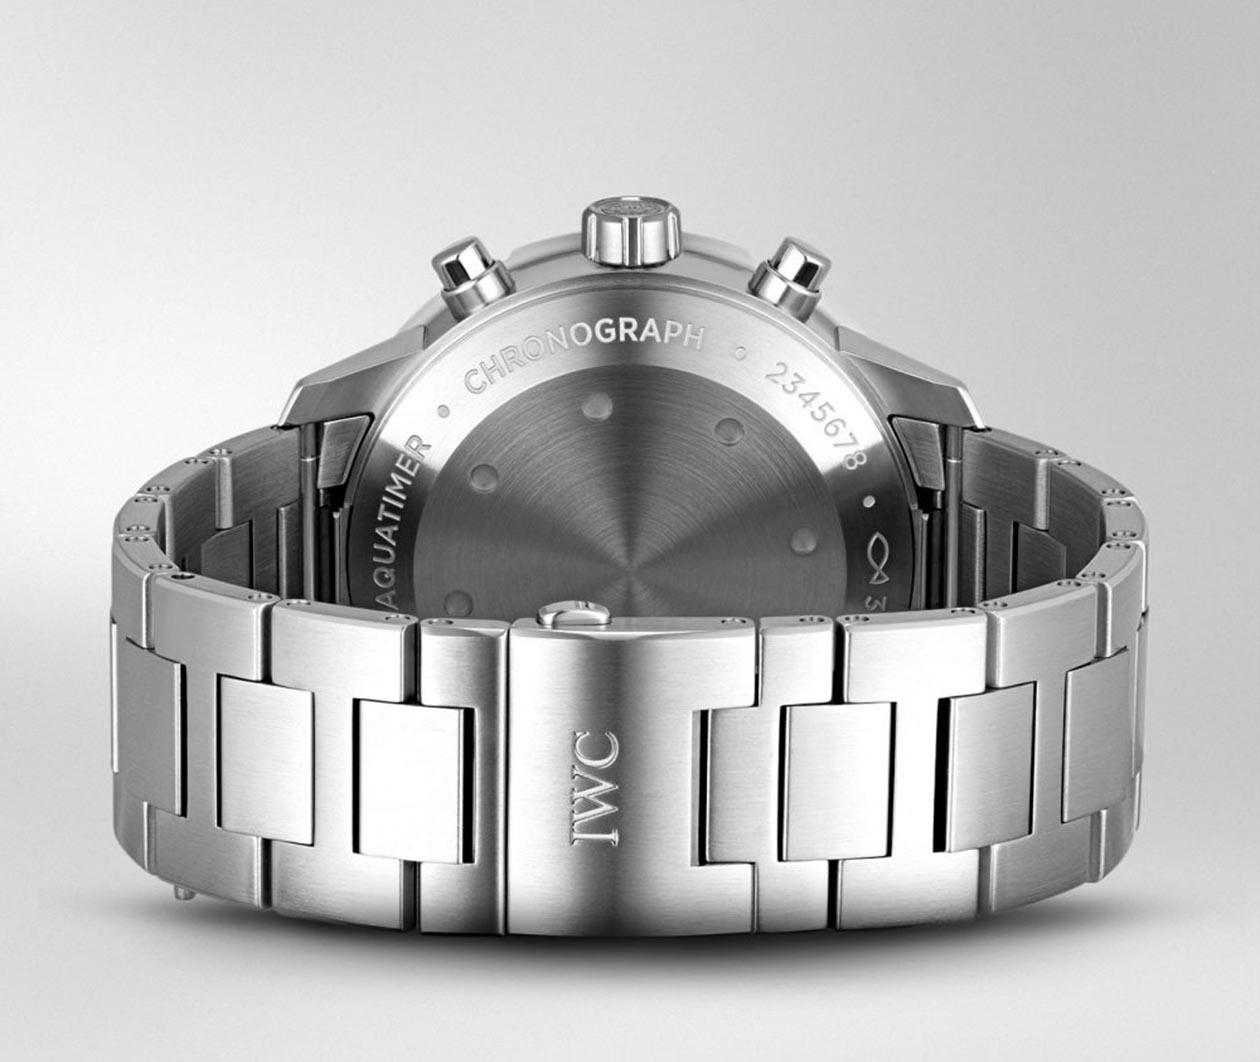 IWC Aquatimer Chronograph IW376804 Carousel 6 FINAL